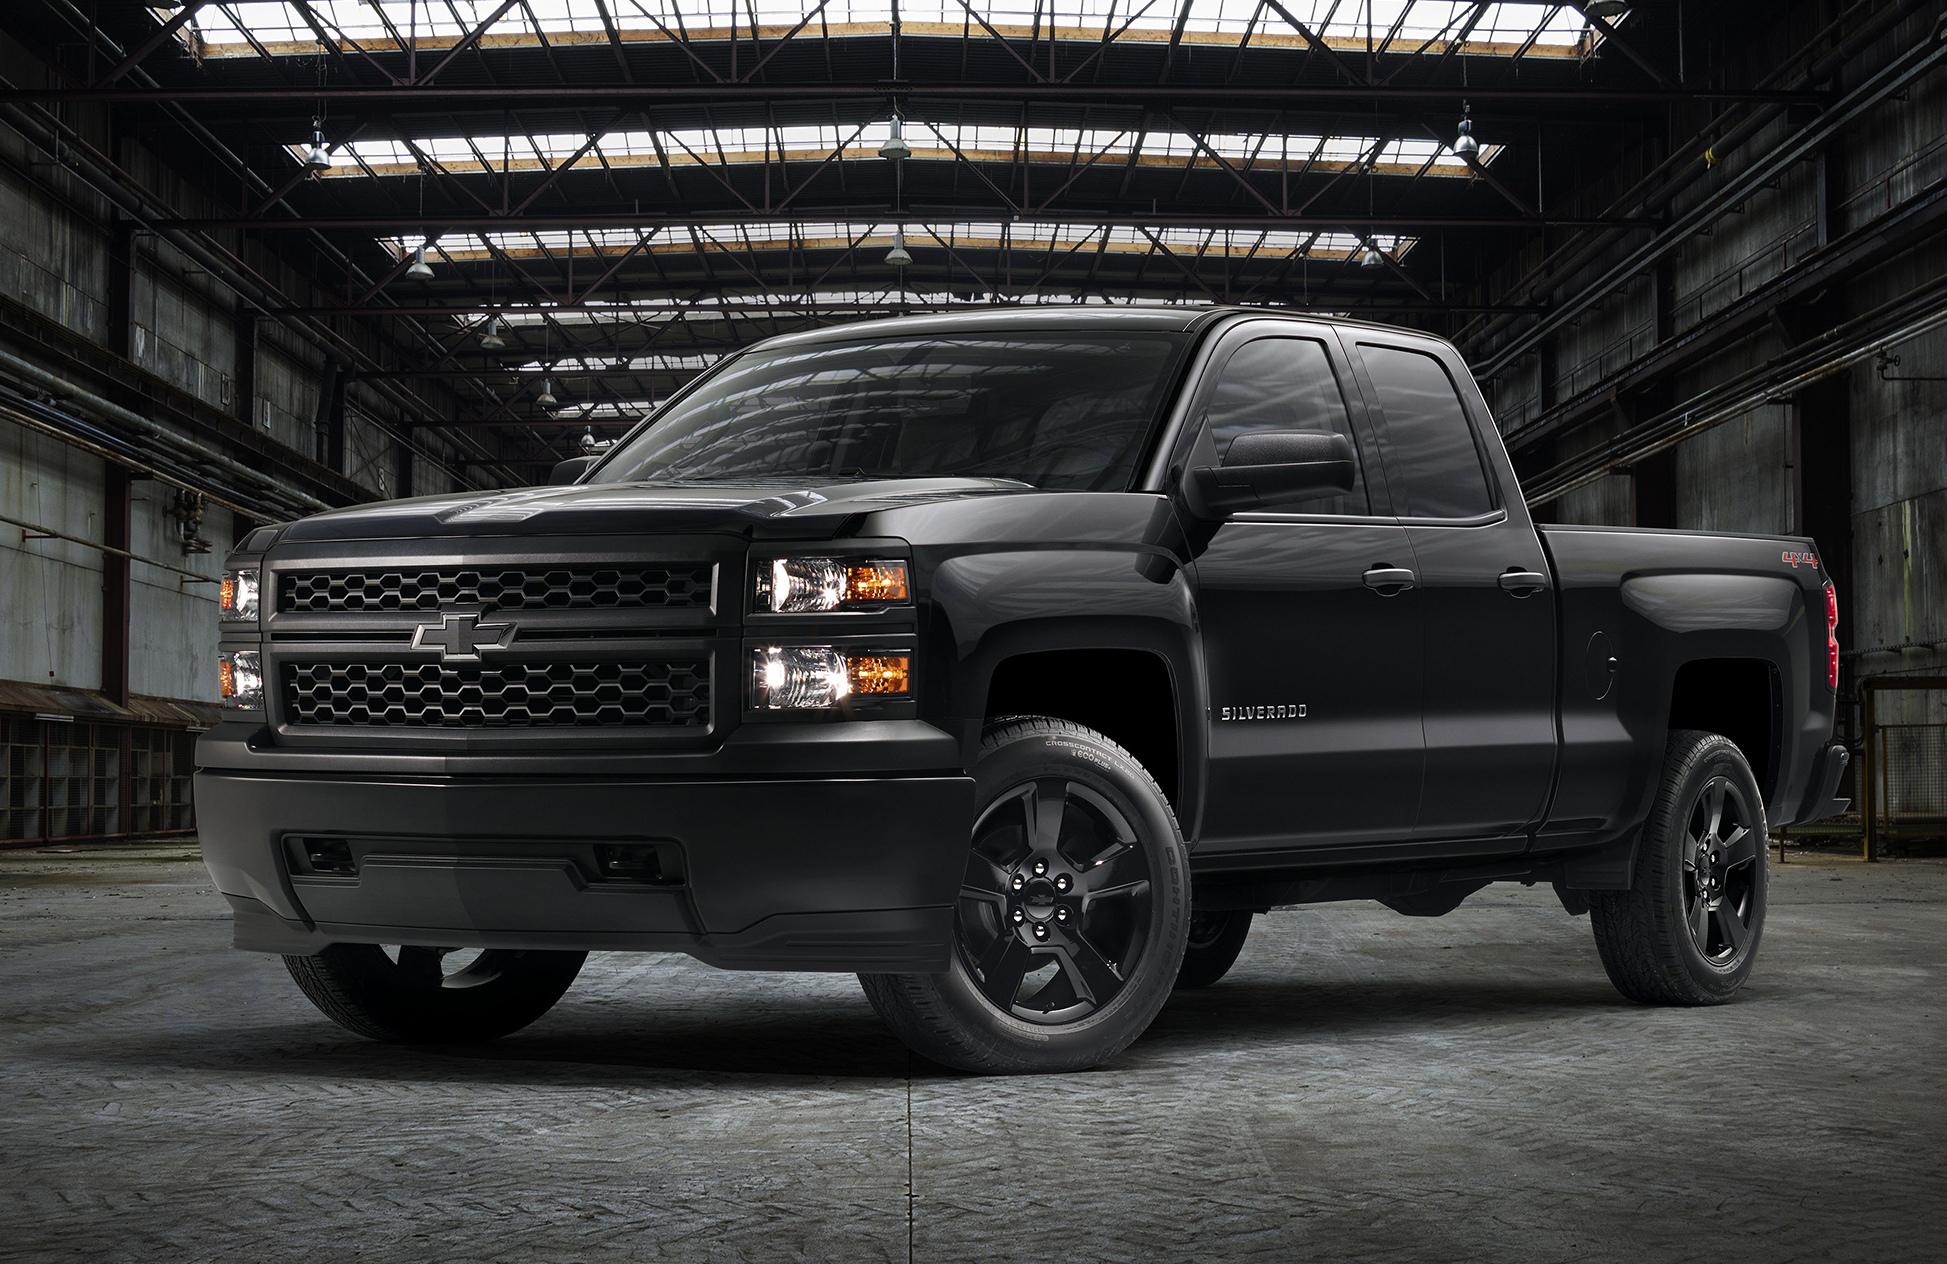 Chevy Silverado Work Trucks Get Black-Out Package   Medium ...